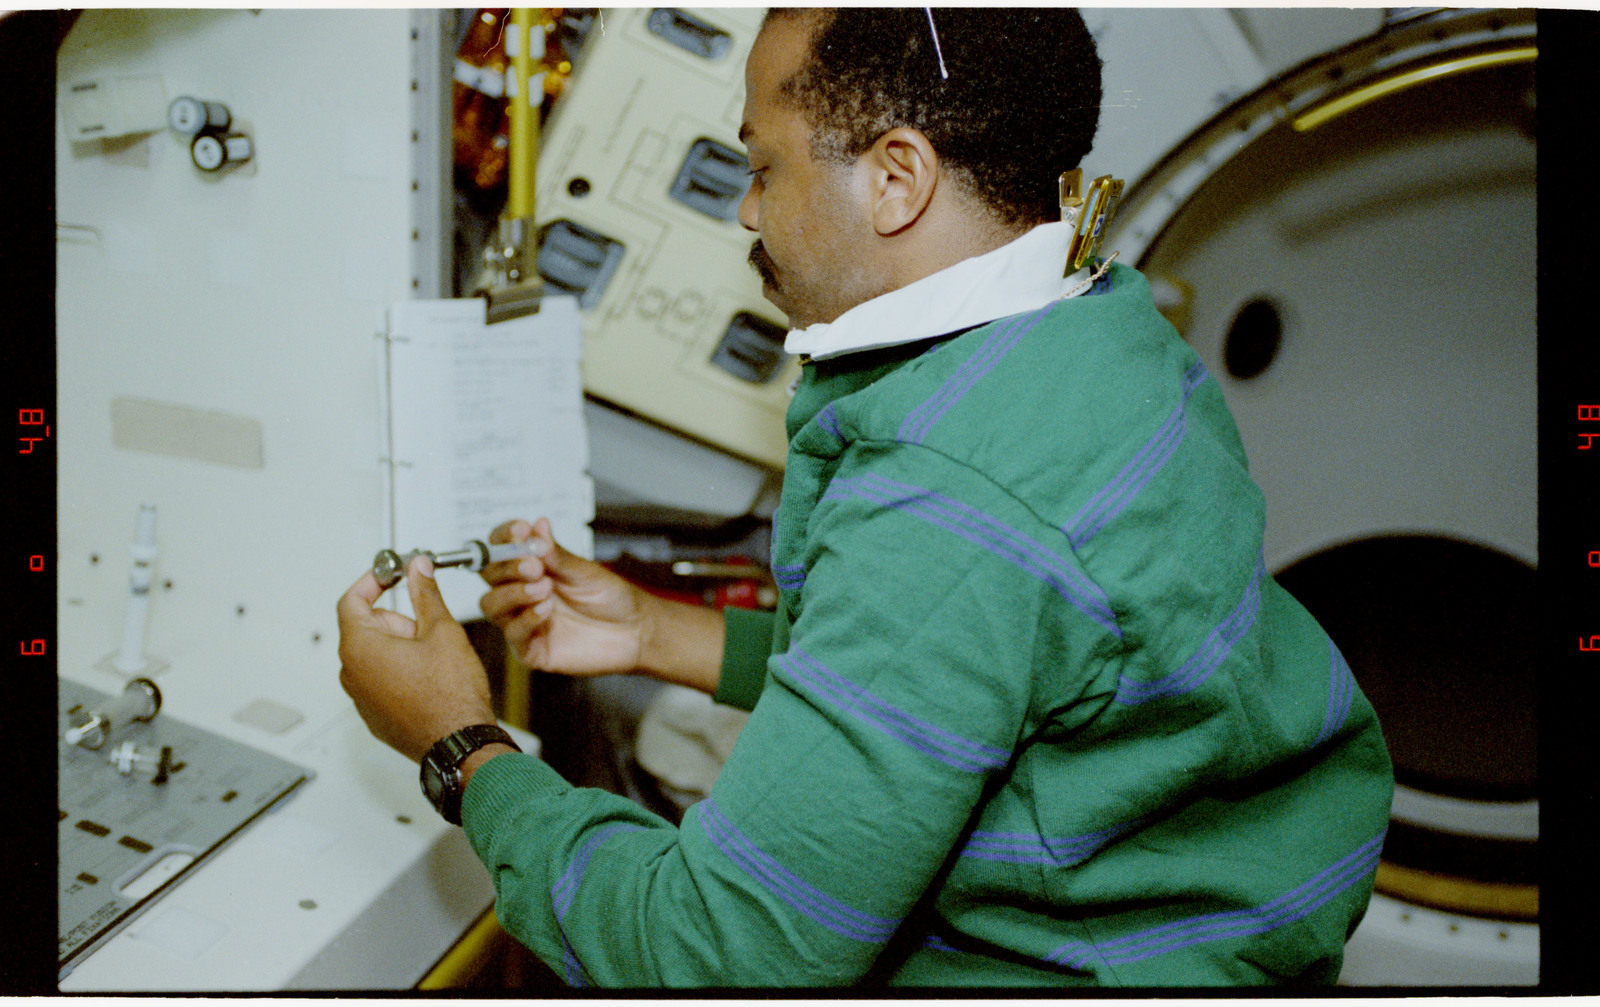 STS055-23-012 - STS-055 - Crewmember at Work Preparing Syringes in the D-2 Spacelab